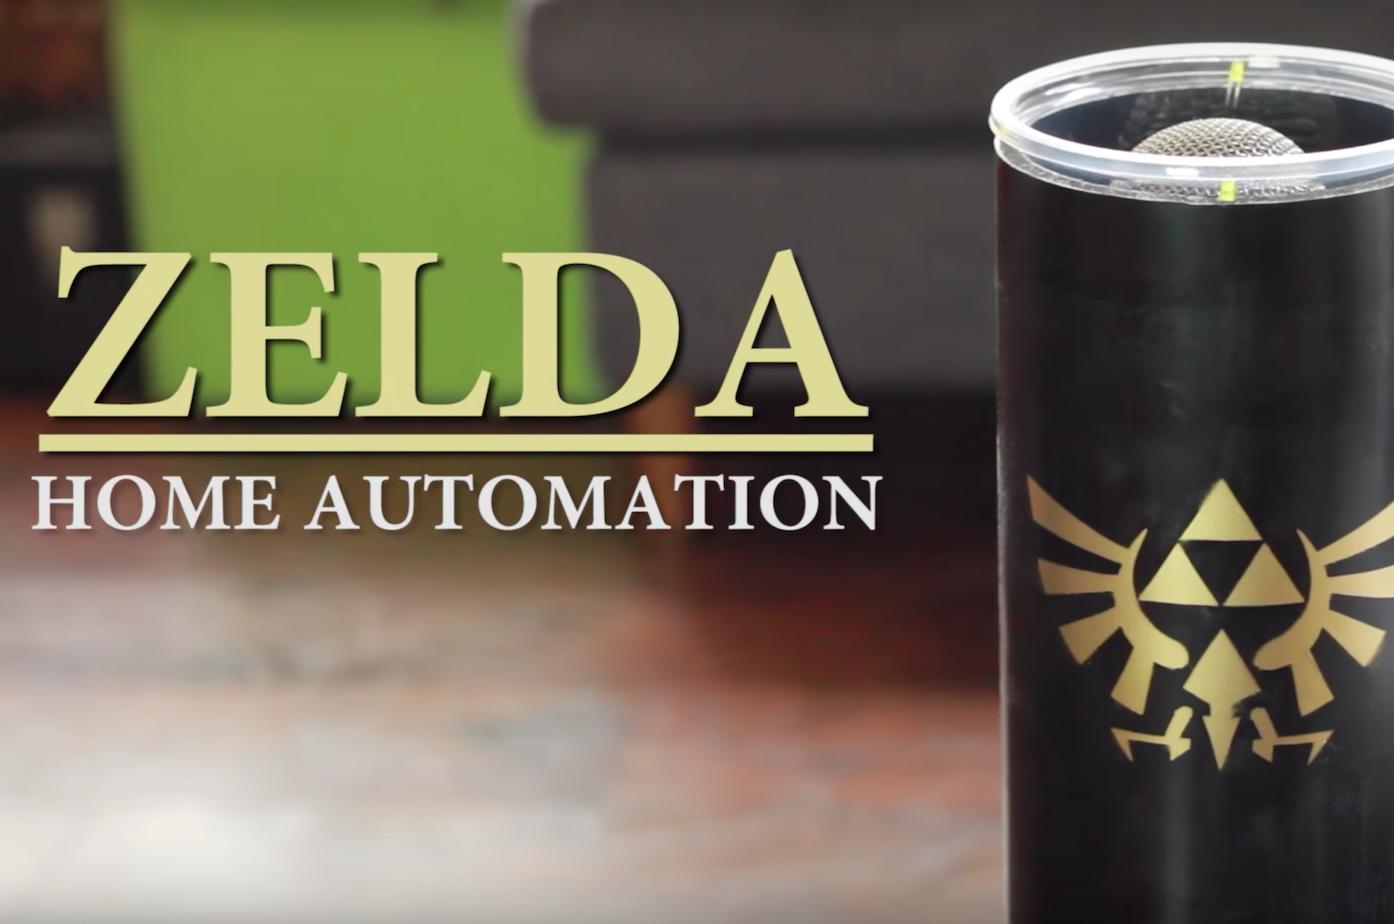 Zelda Home Automation with Raspberry Pi